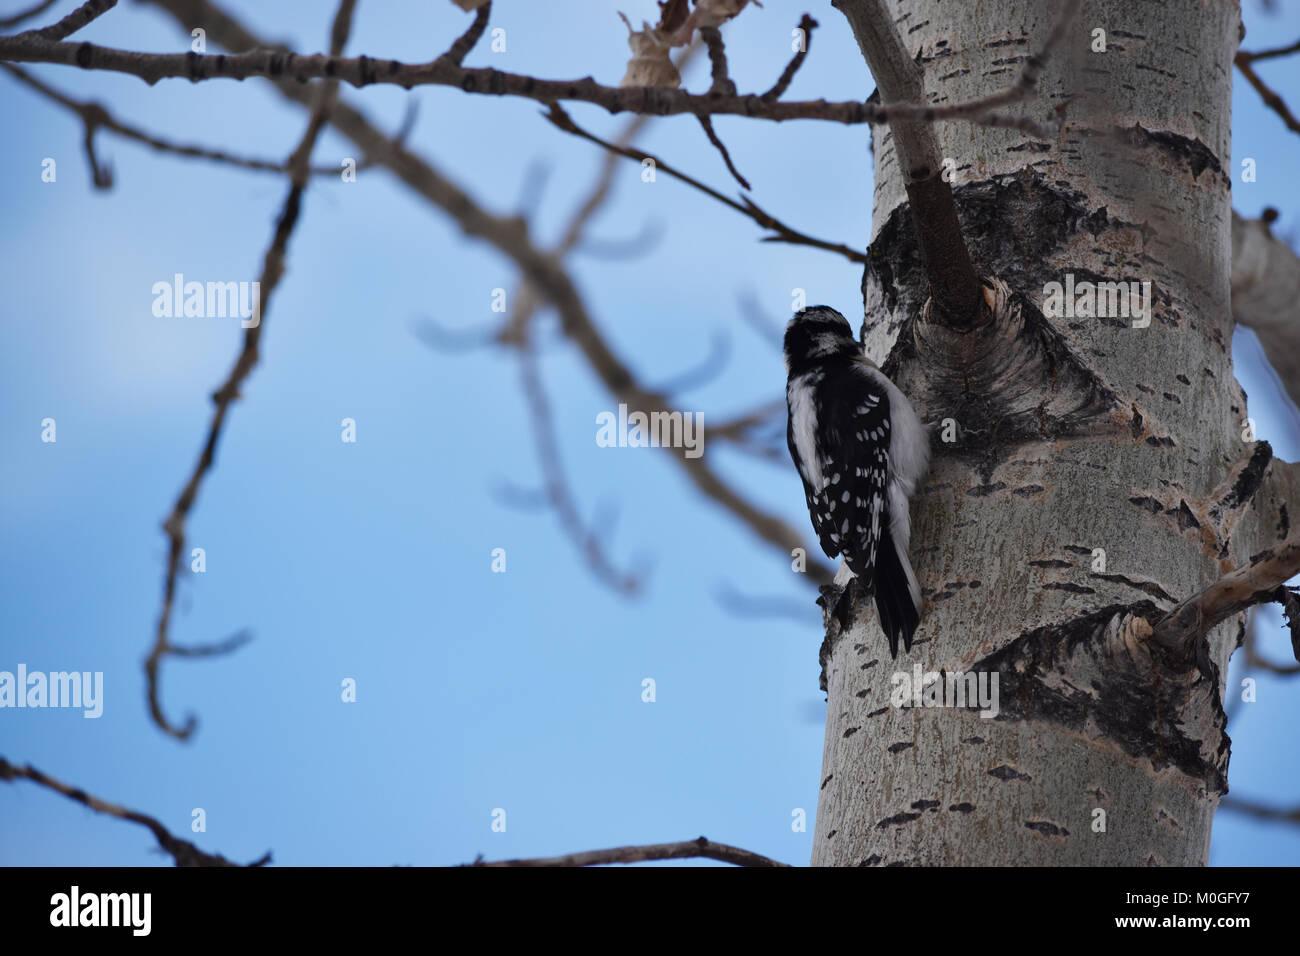 Downy Woodpecker (Dryobates pubescens) sitting in a tree, Inglewood Bird Sanctuary, Calgary, Alberta. Stock Photo